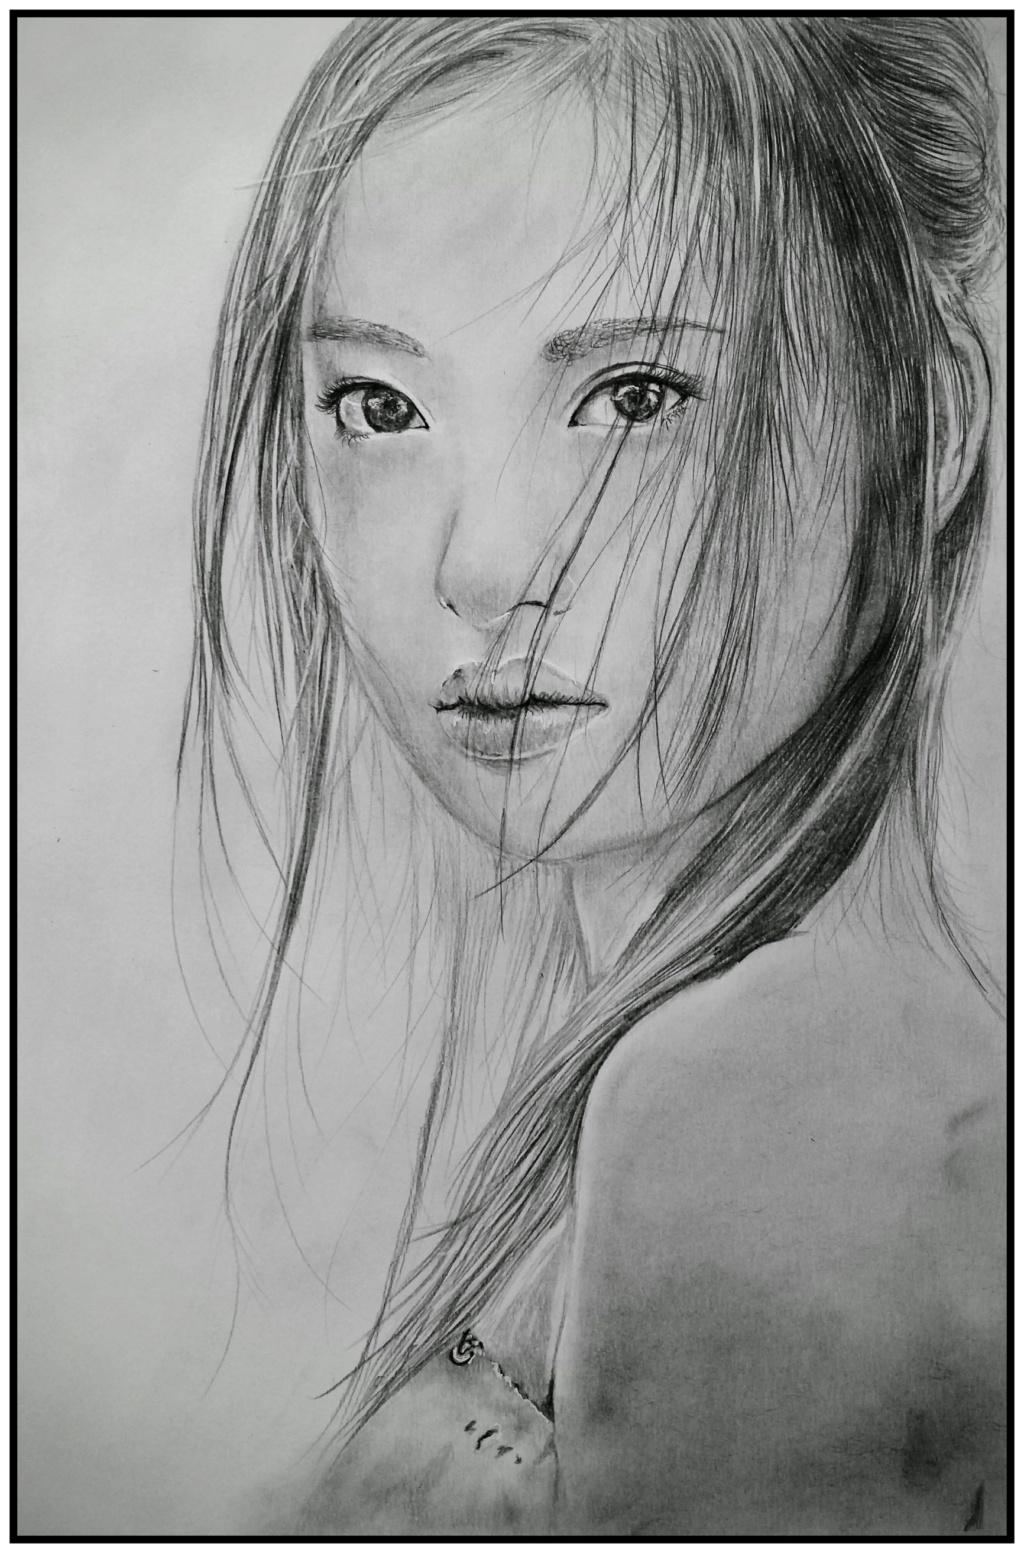 Aya Ueto Aya_ue10